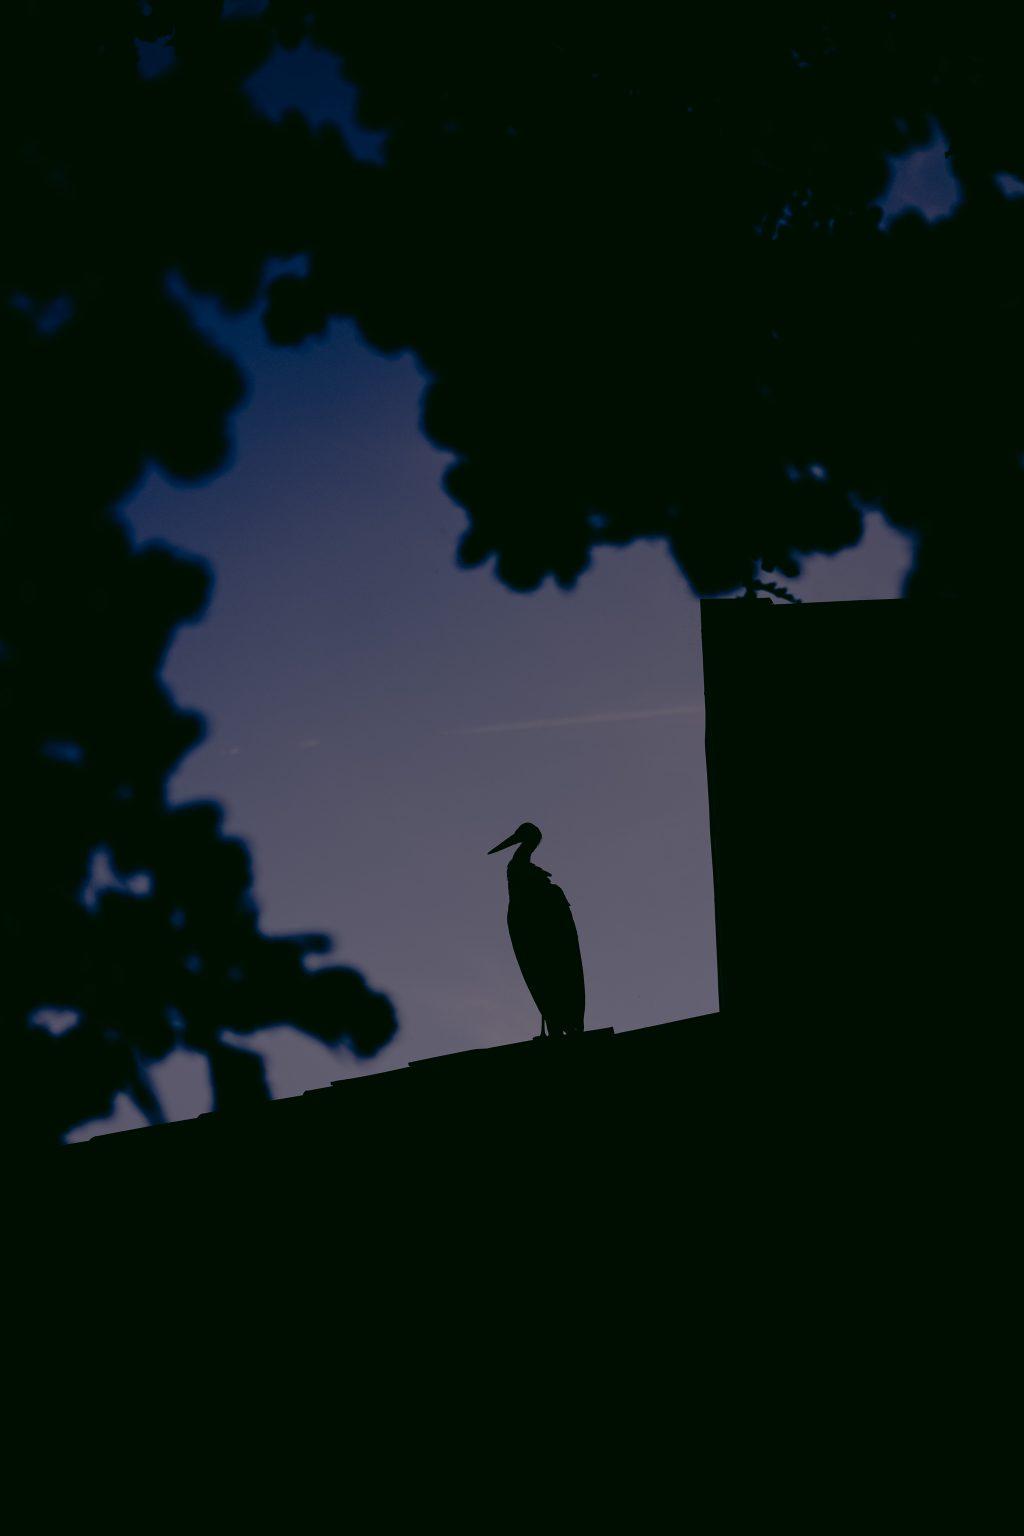 Valdivienne, France, August 2019 - The white stork Mildred at night on the roof of Tristan Plot?s new house. >< Valdivienne, Francia, agosto 2019 -  La cicogna bianca Mildred di notte sul tetto della nuova casa di Tristan Plot.*** SPECIAL   FEE   APPLIES ***